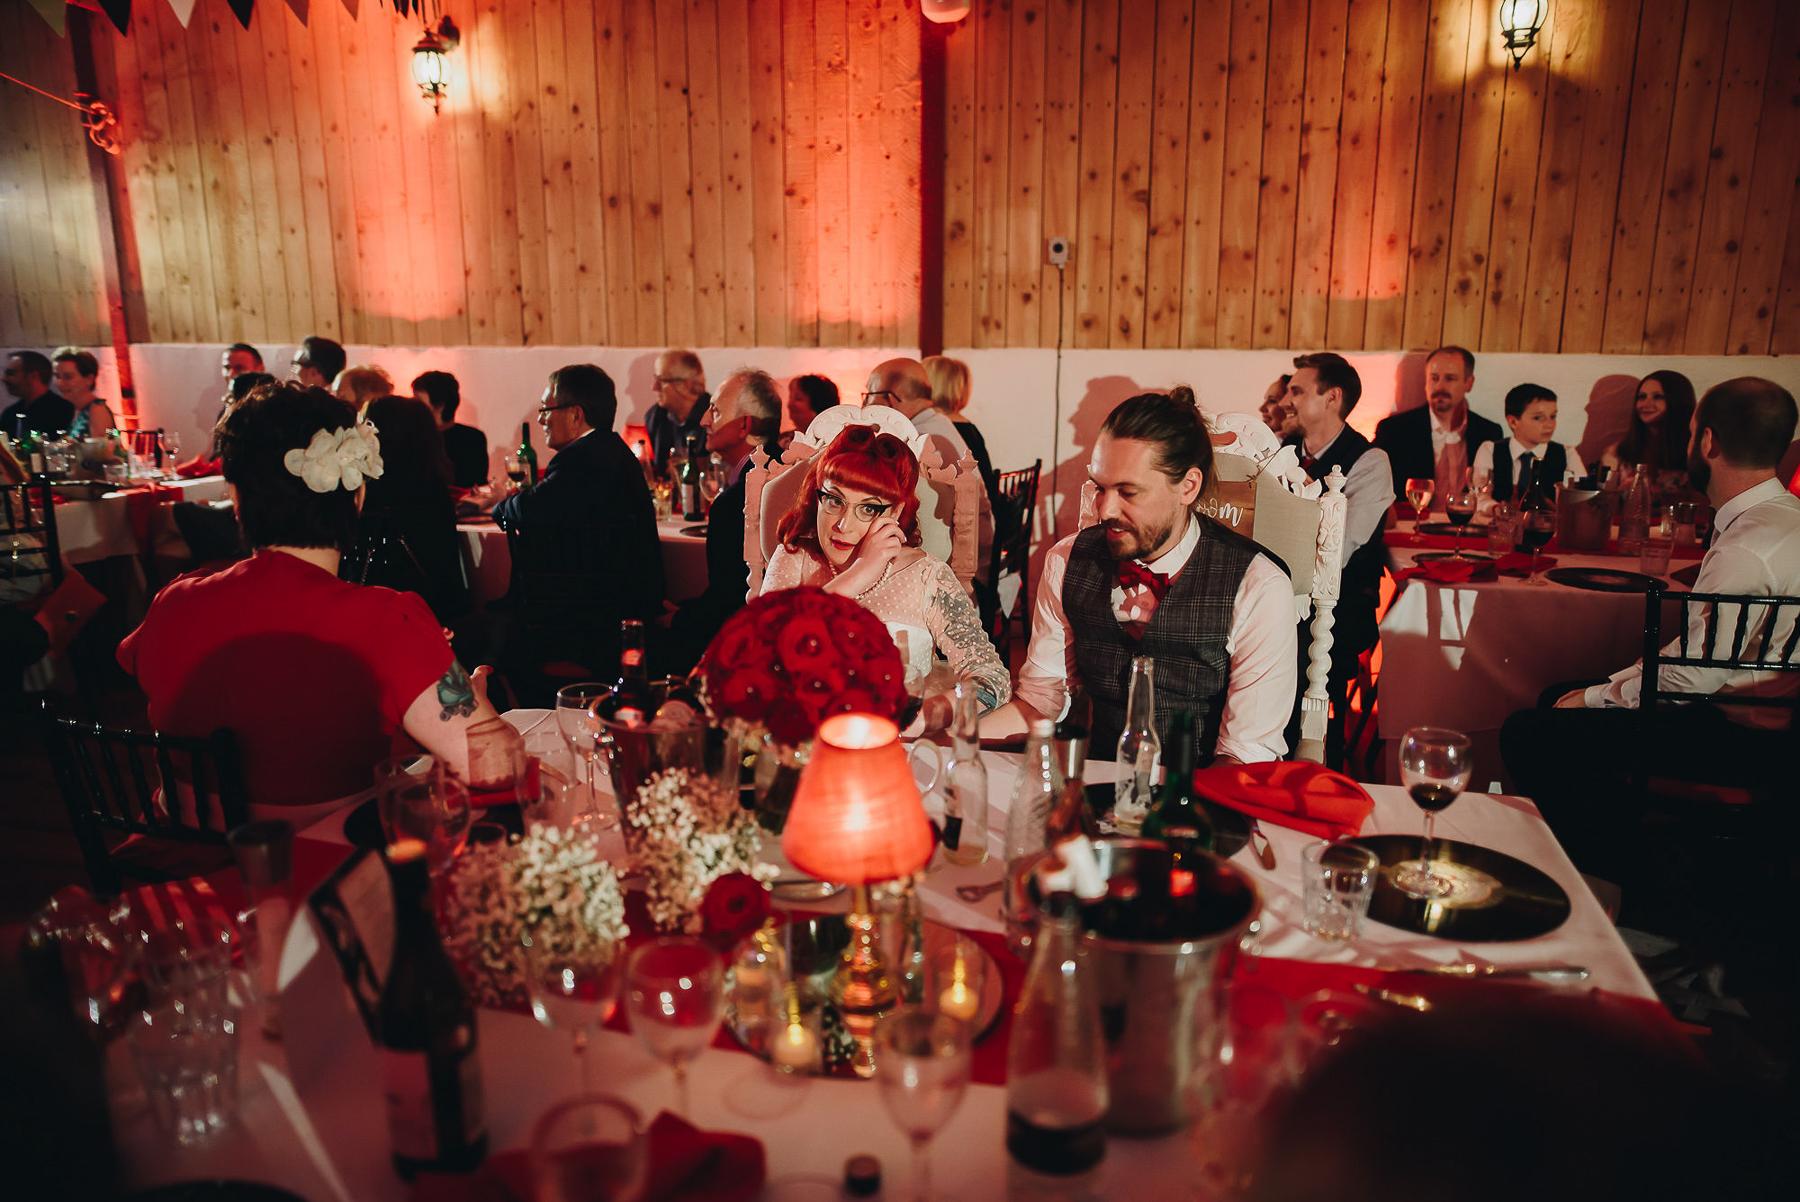 Wellbeing_Farm_Wedding_Photography_The_Pin-Up_Bride_Lara_Shaun-133.jpg